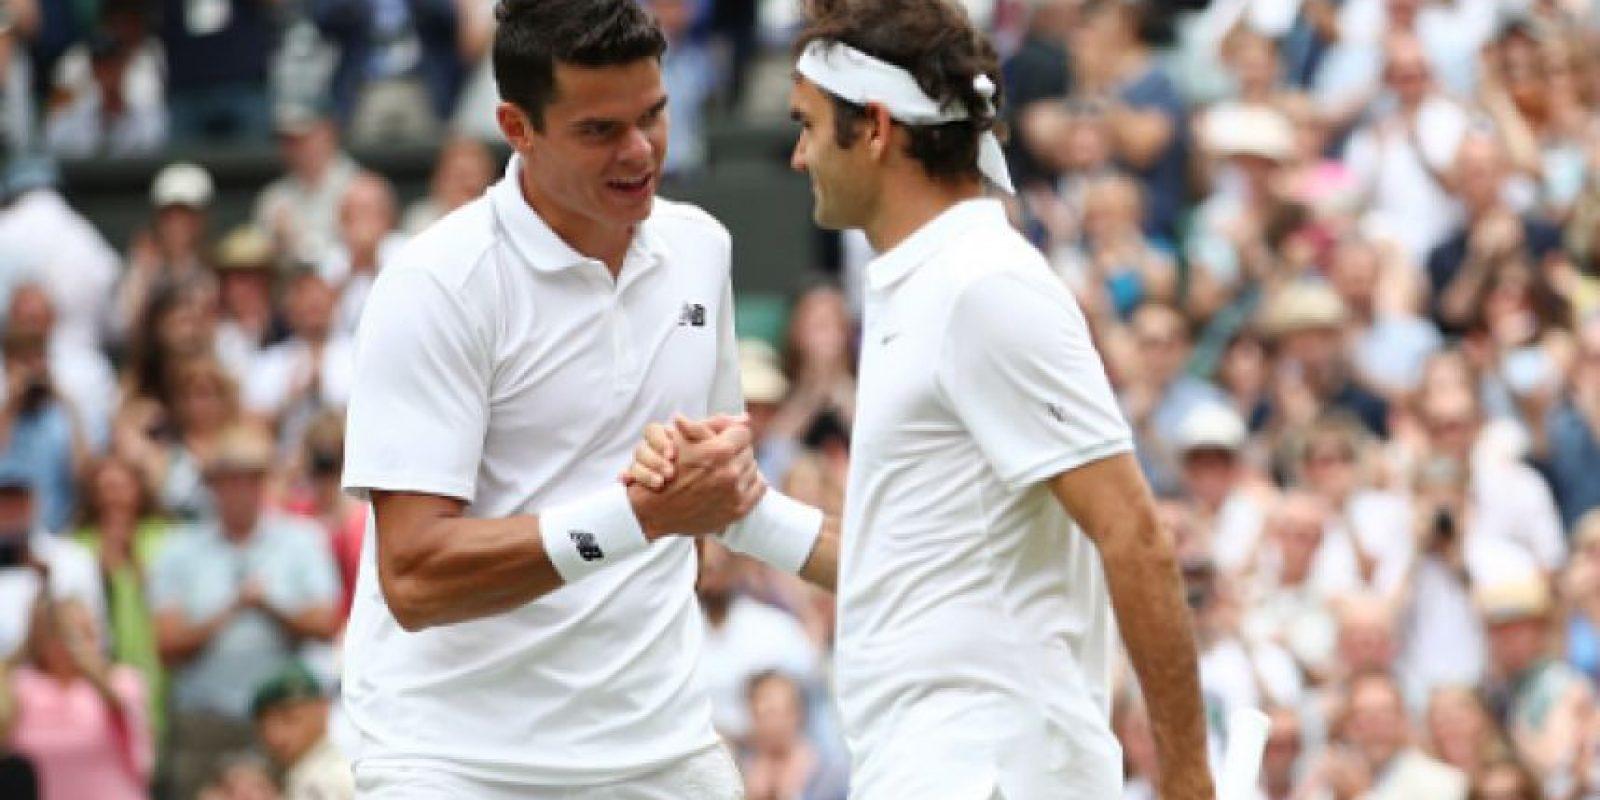 Federer es eliminado de Wimbledon por Milos Raonic Foto:Getty Images